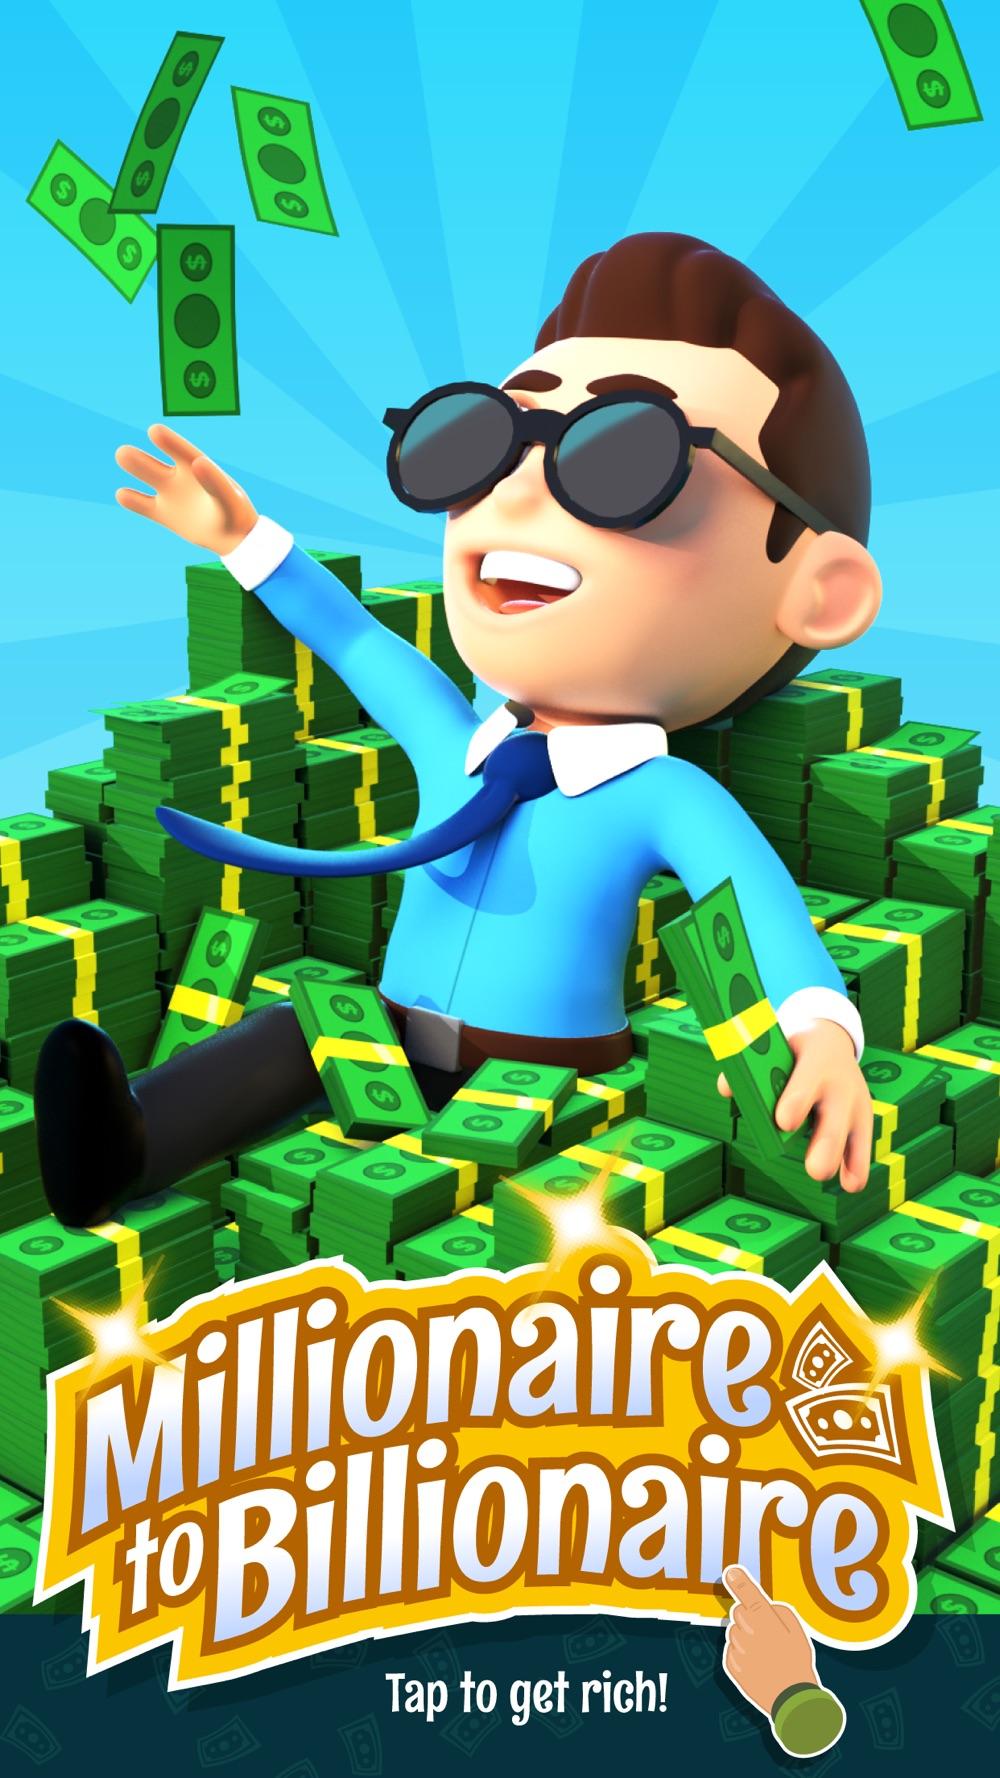 Millionaire To Billionaire – Clicker Game Cheat Codes